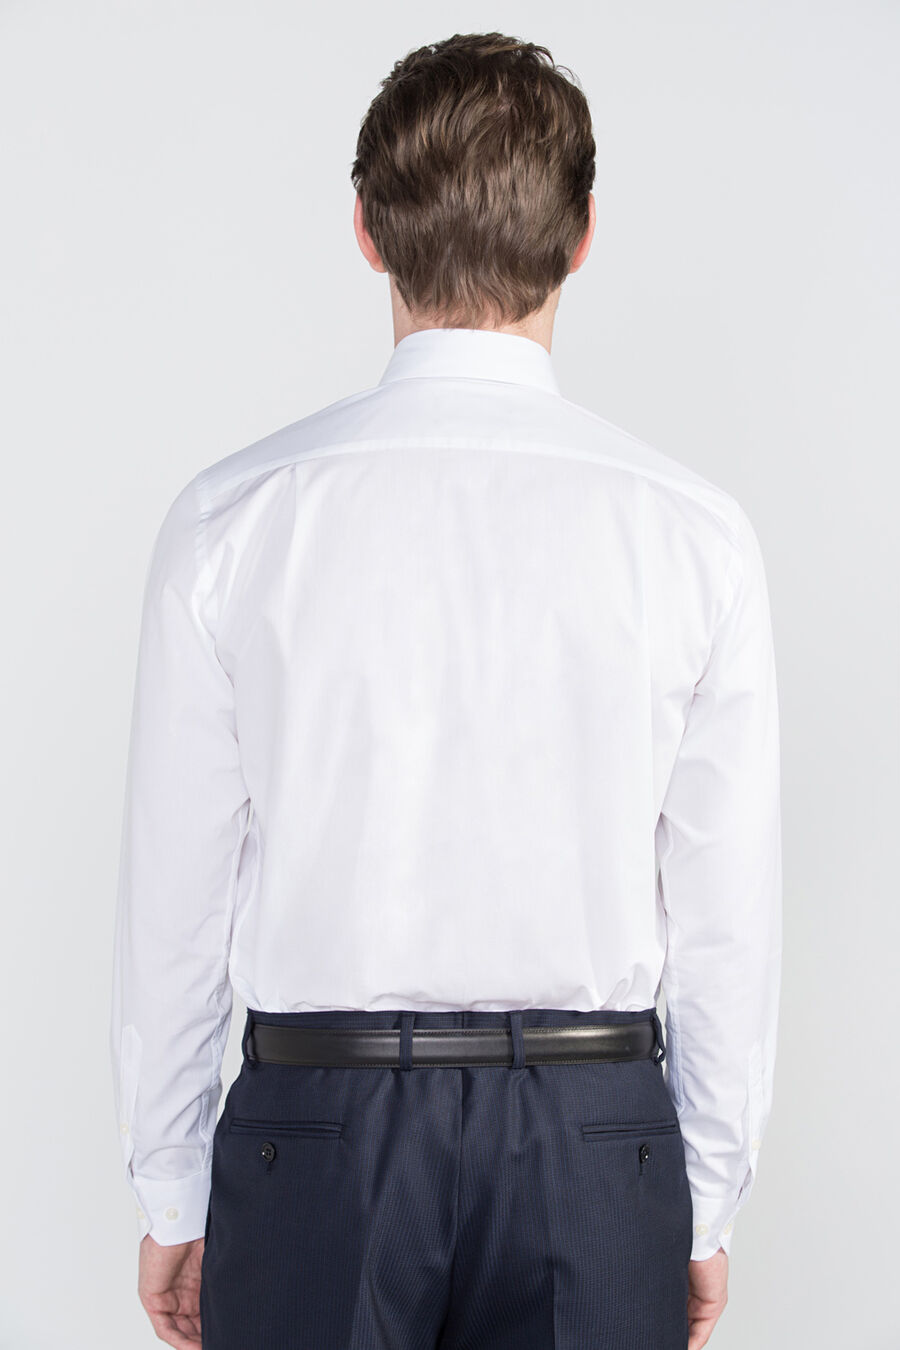 Classic plain dress shirt